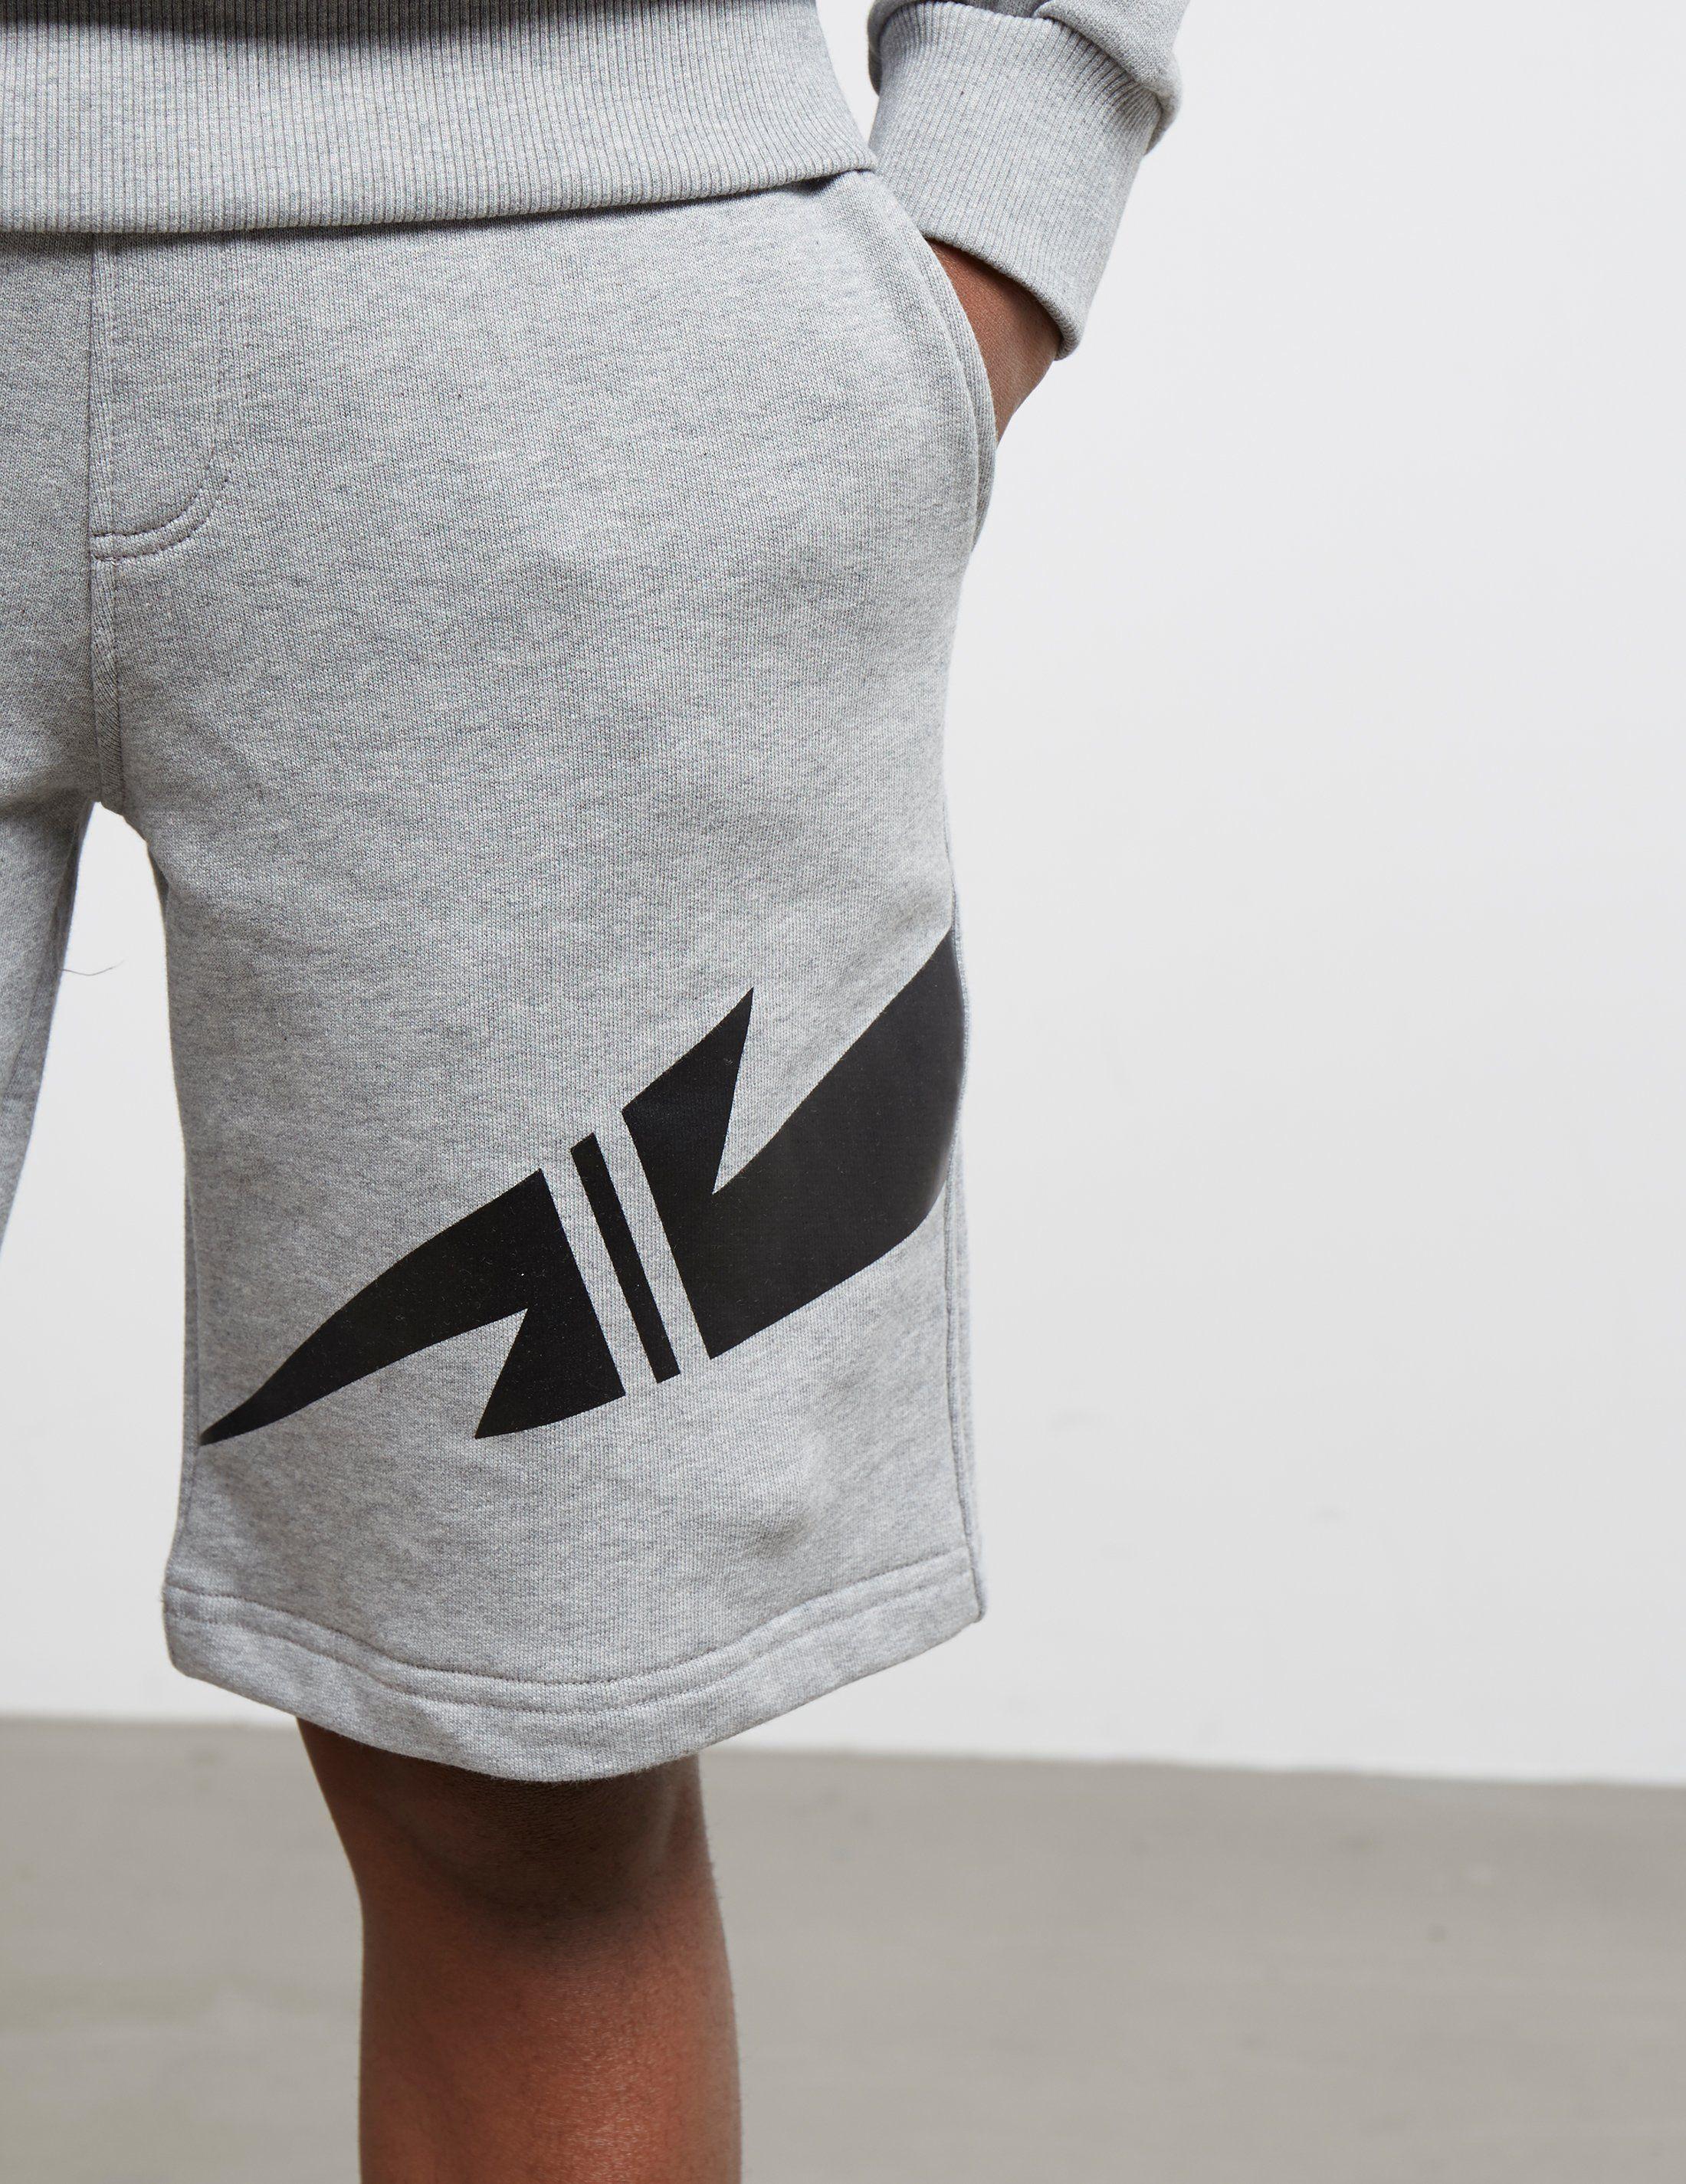 Neil Barrett Mirror Shorts